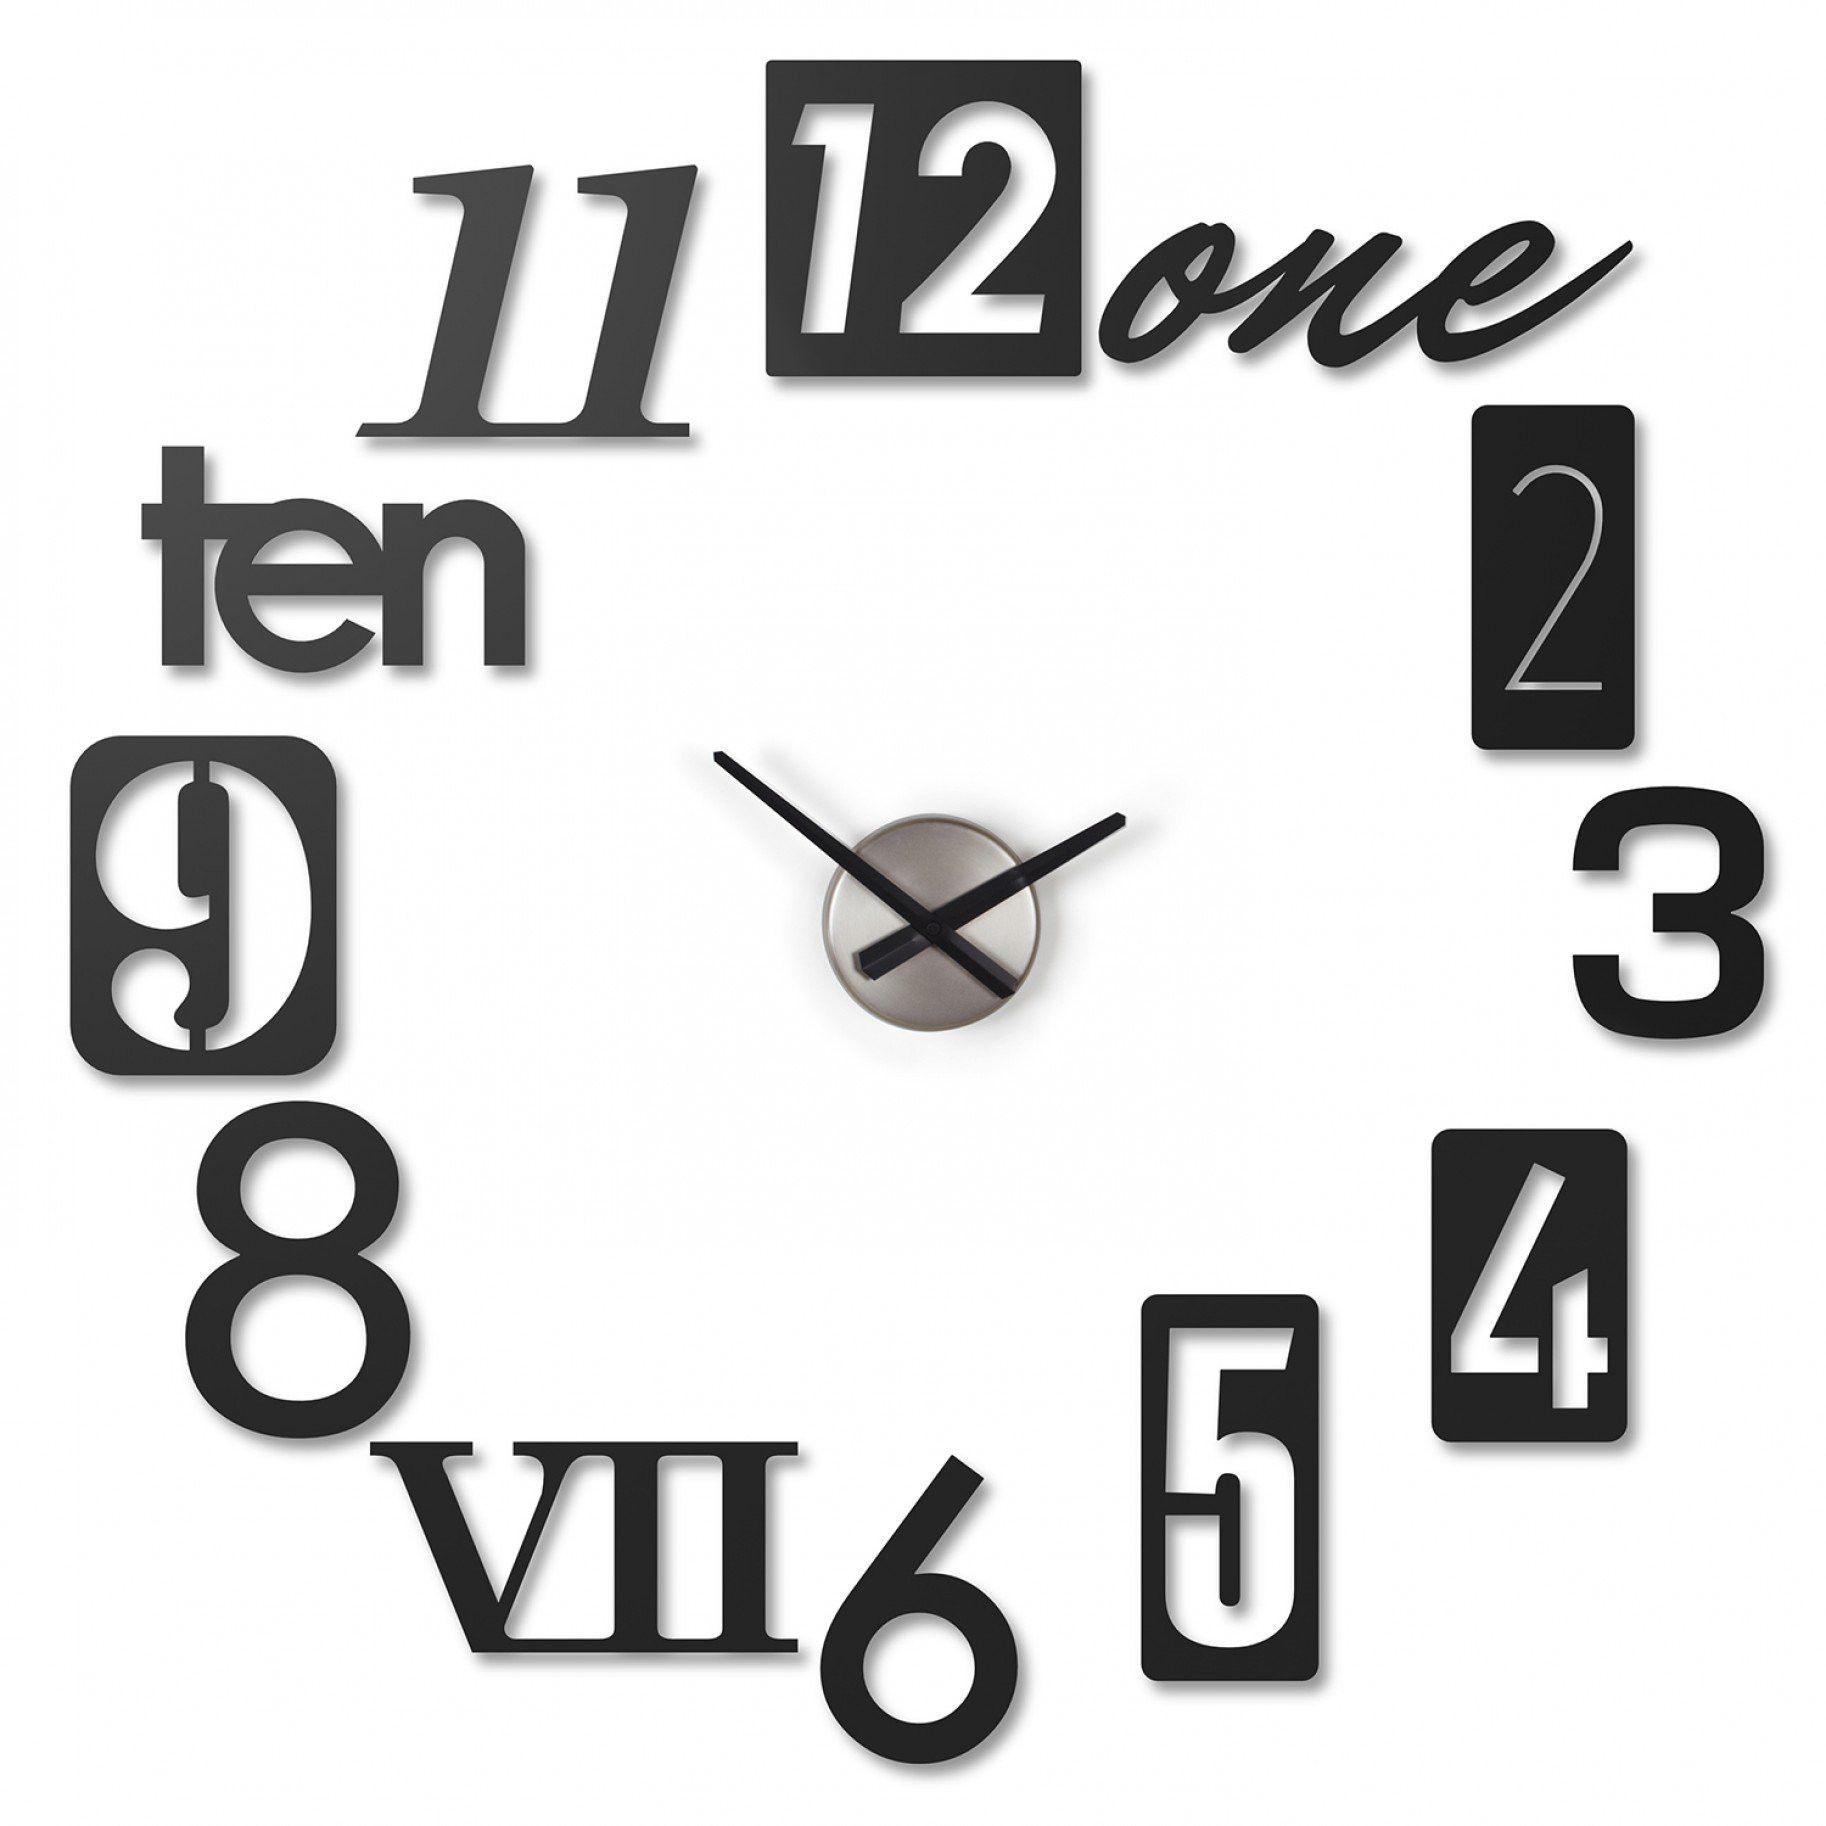 Wall Clock in Black design by Umbra